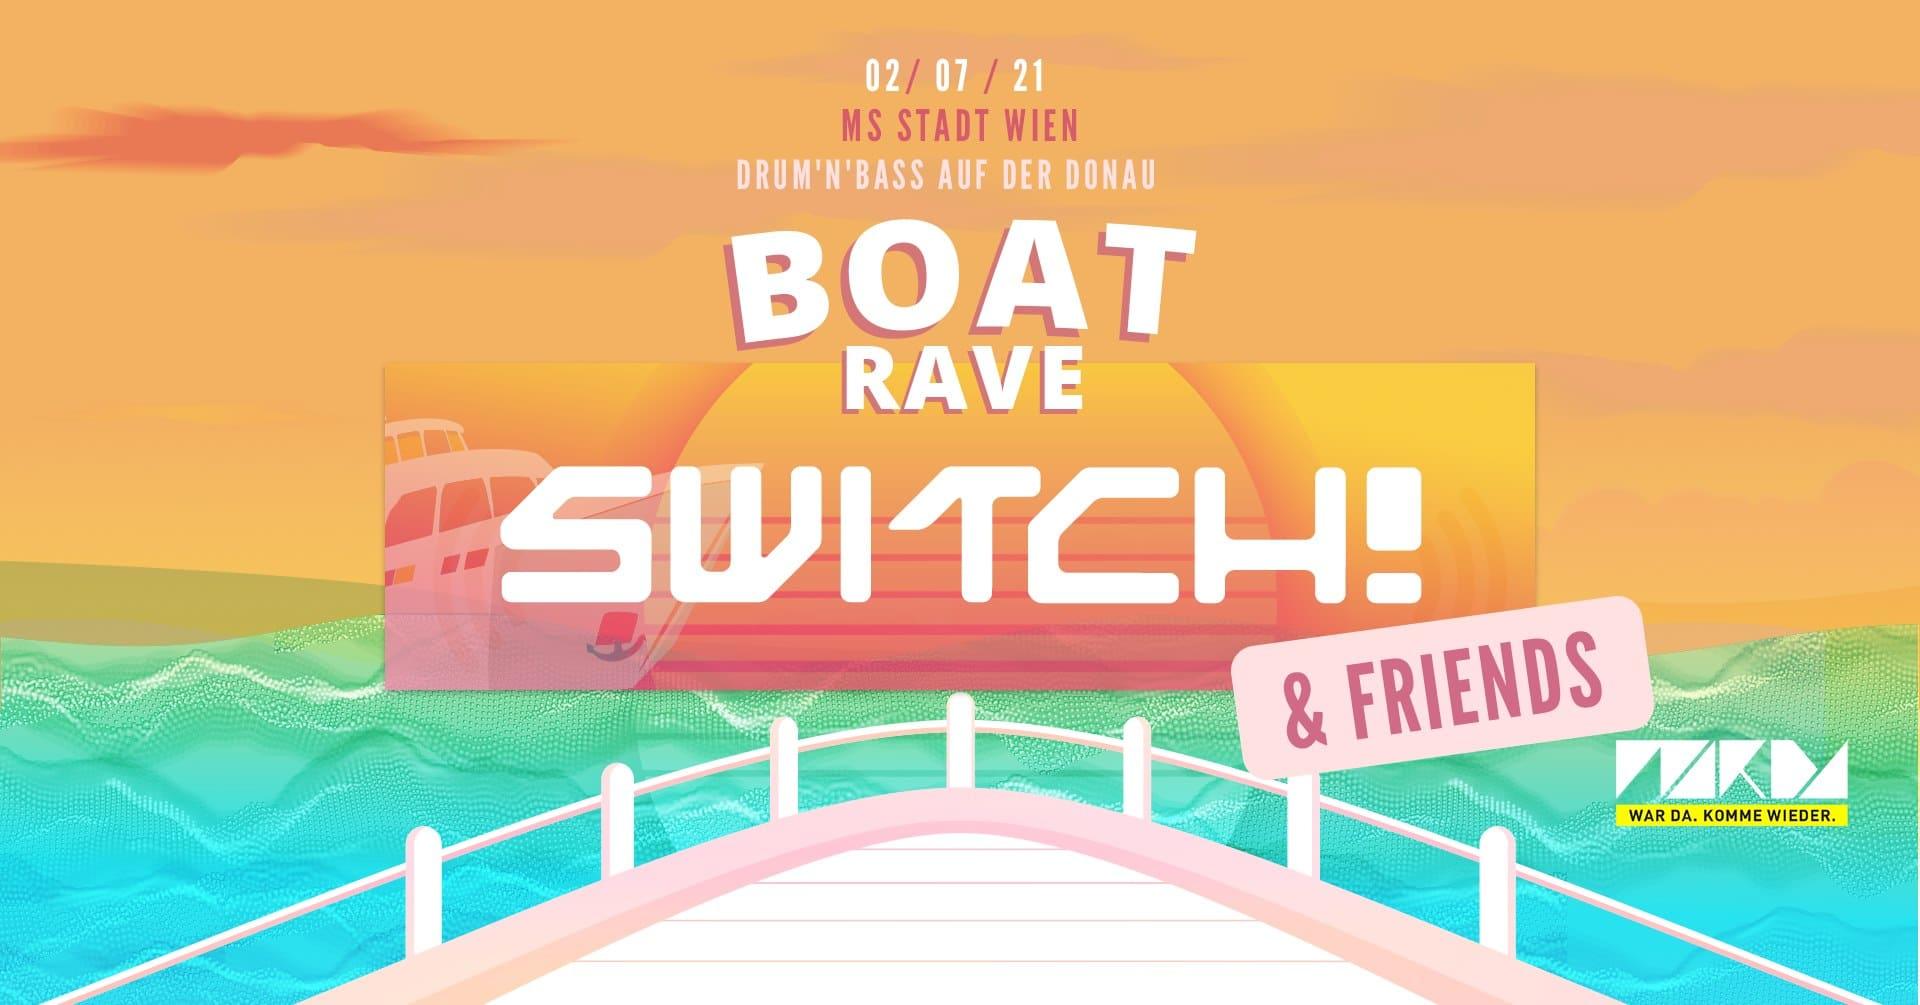 Events Wien: Switch! & Friends BOAT RAVE